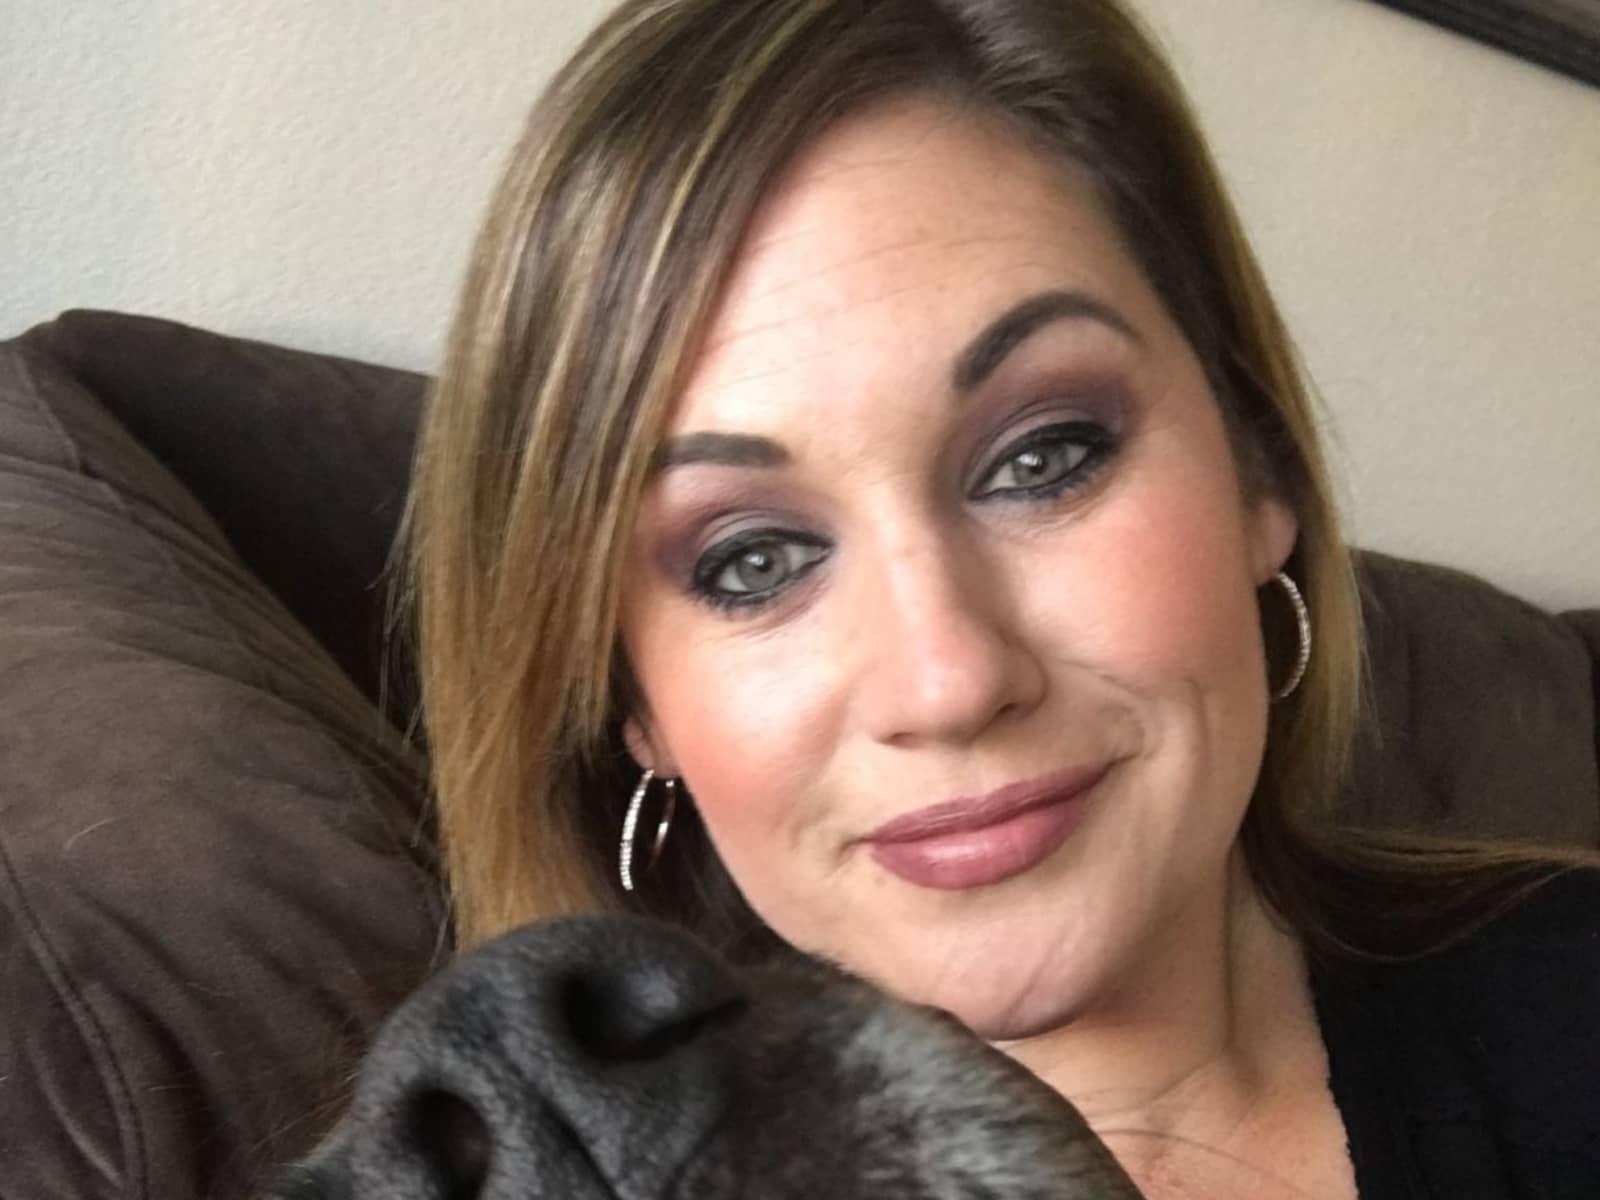 Erin from Atascadero, California, United States